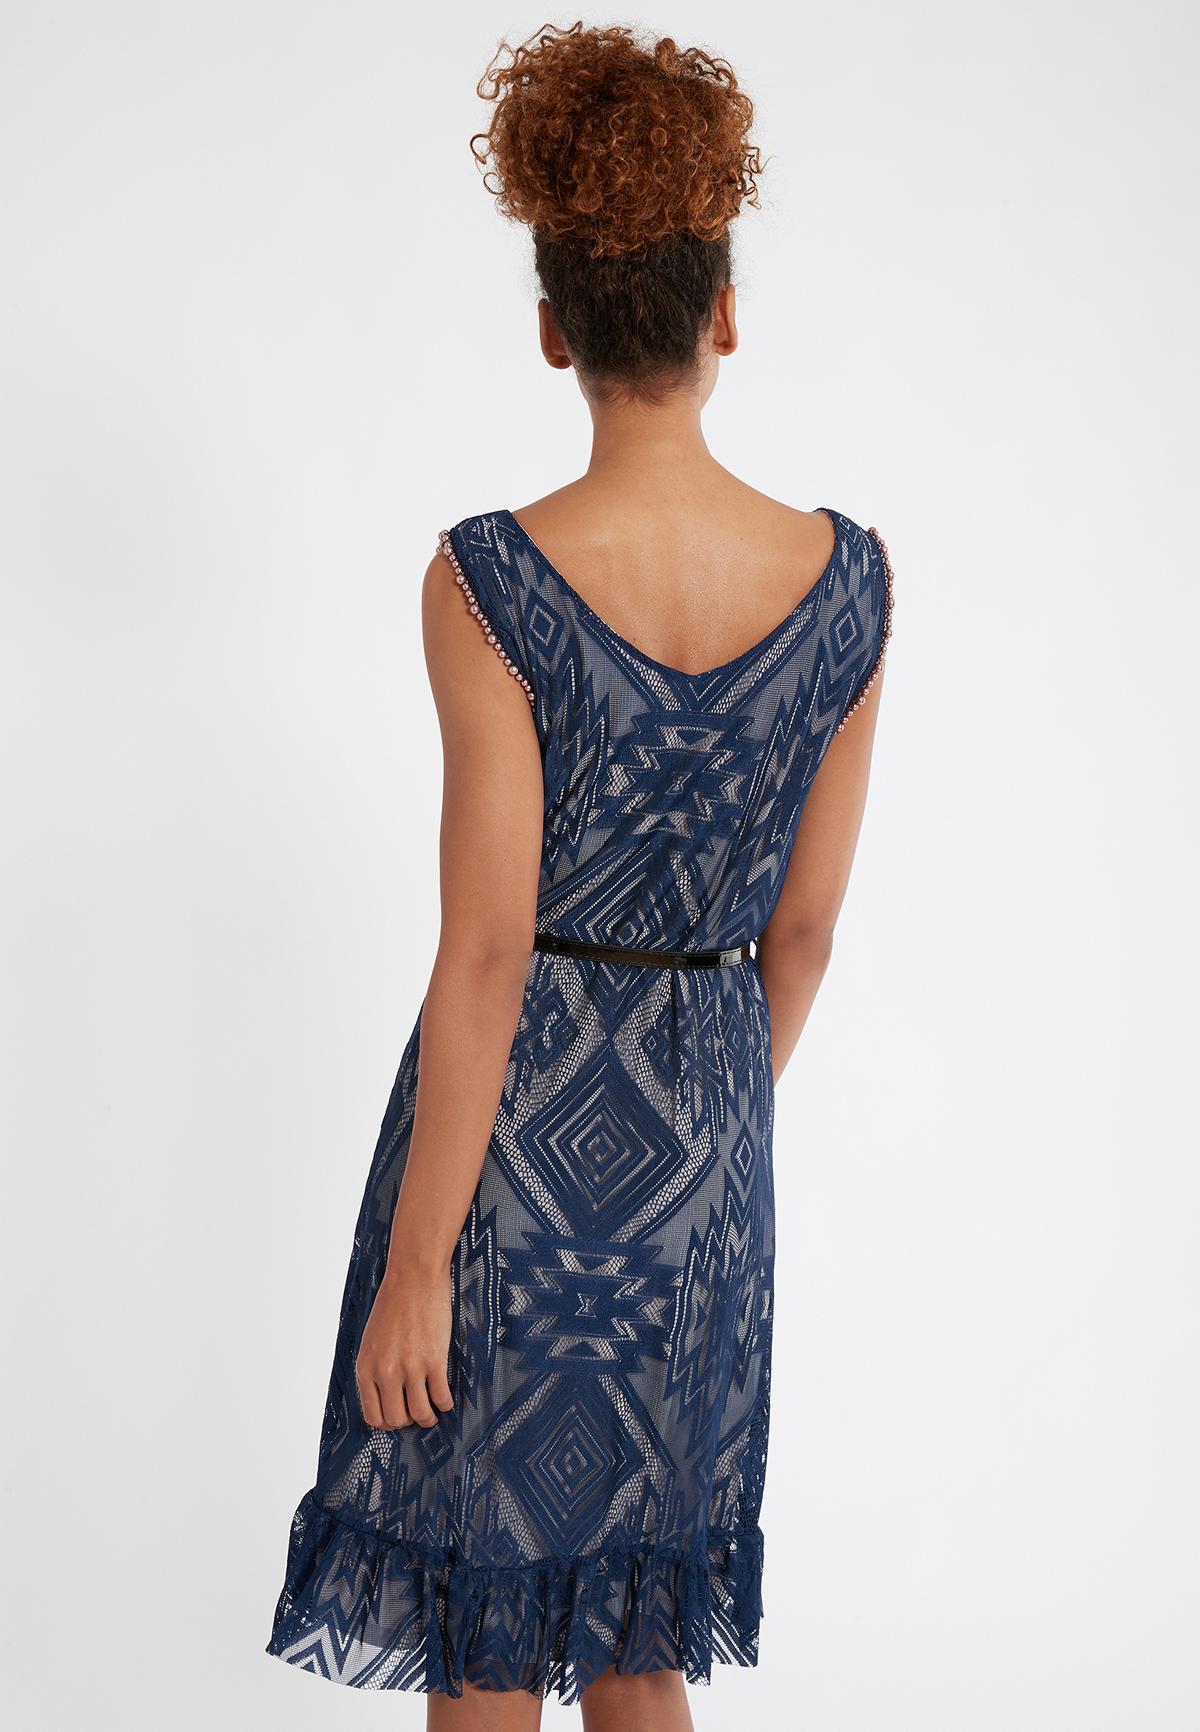 Rear view of Ana Alcazar Sleeveless Dress Saprona  worn by model